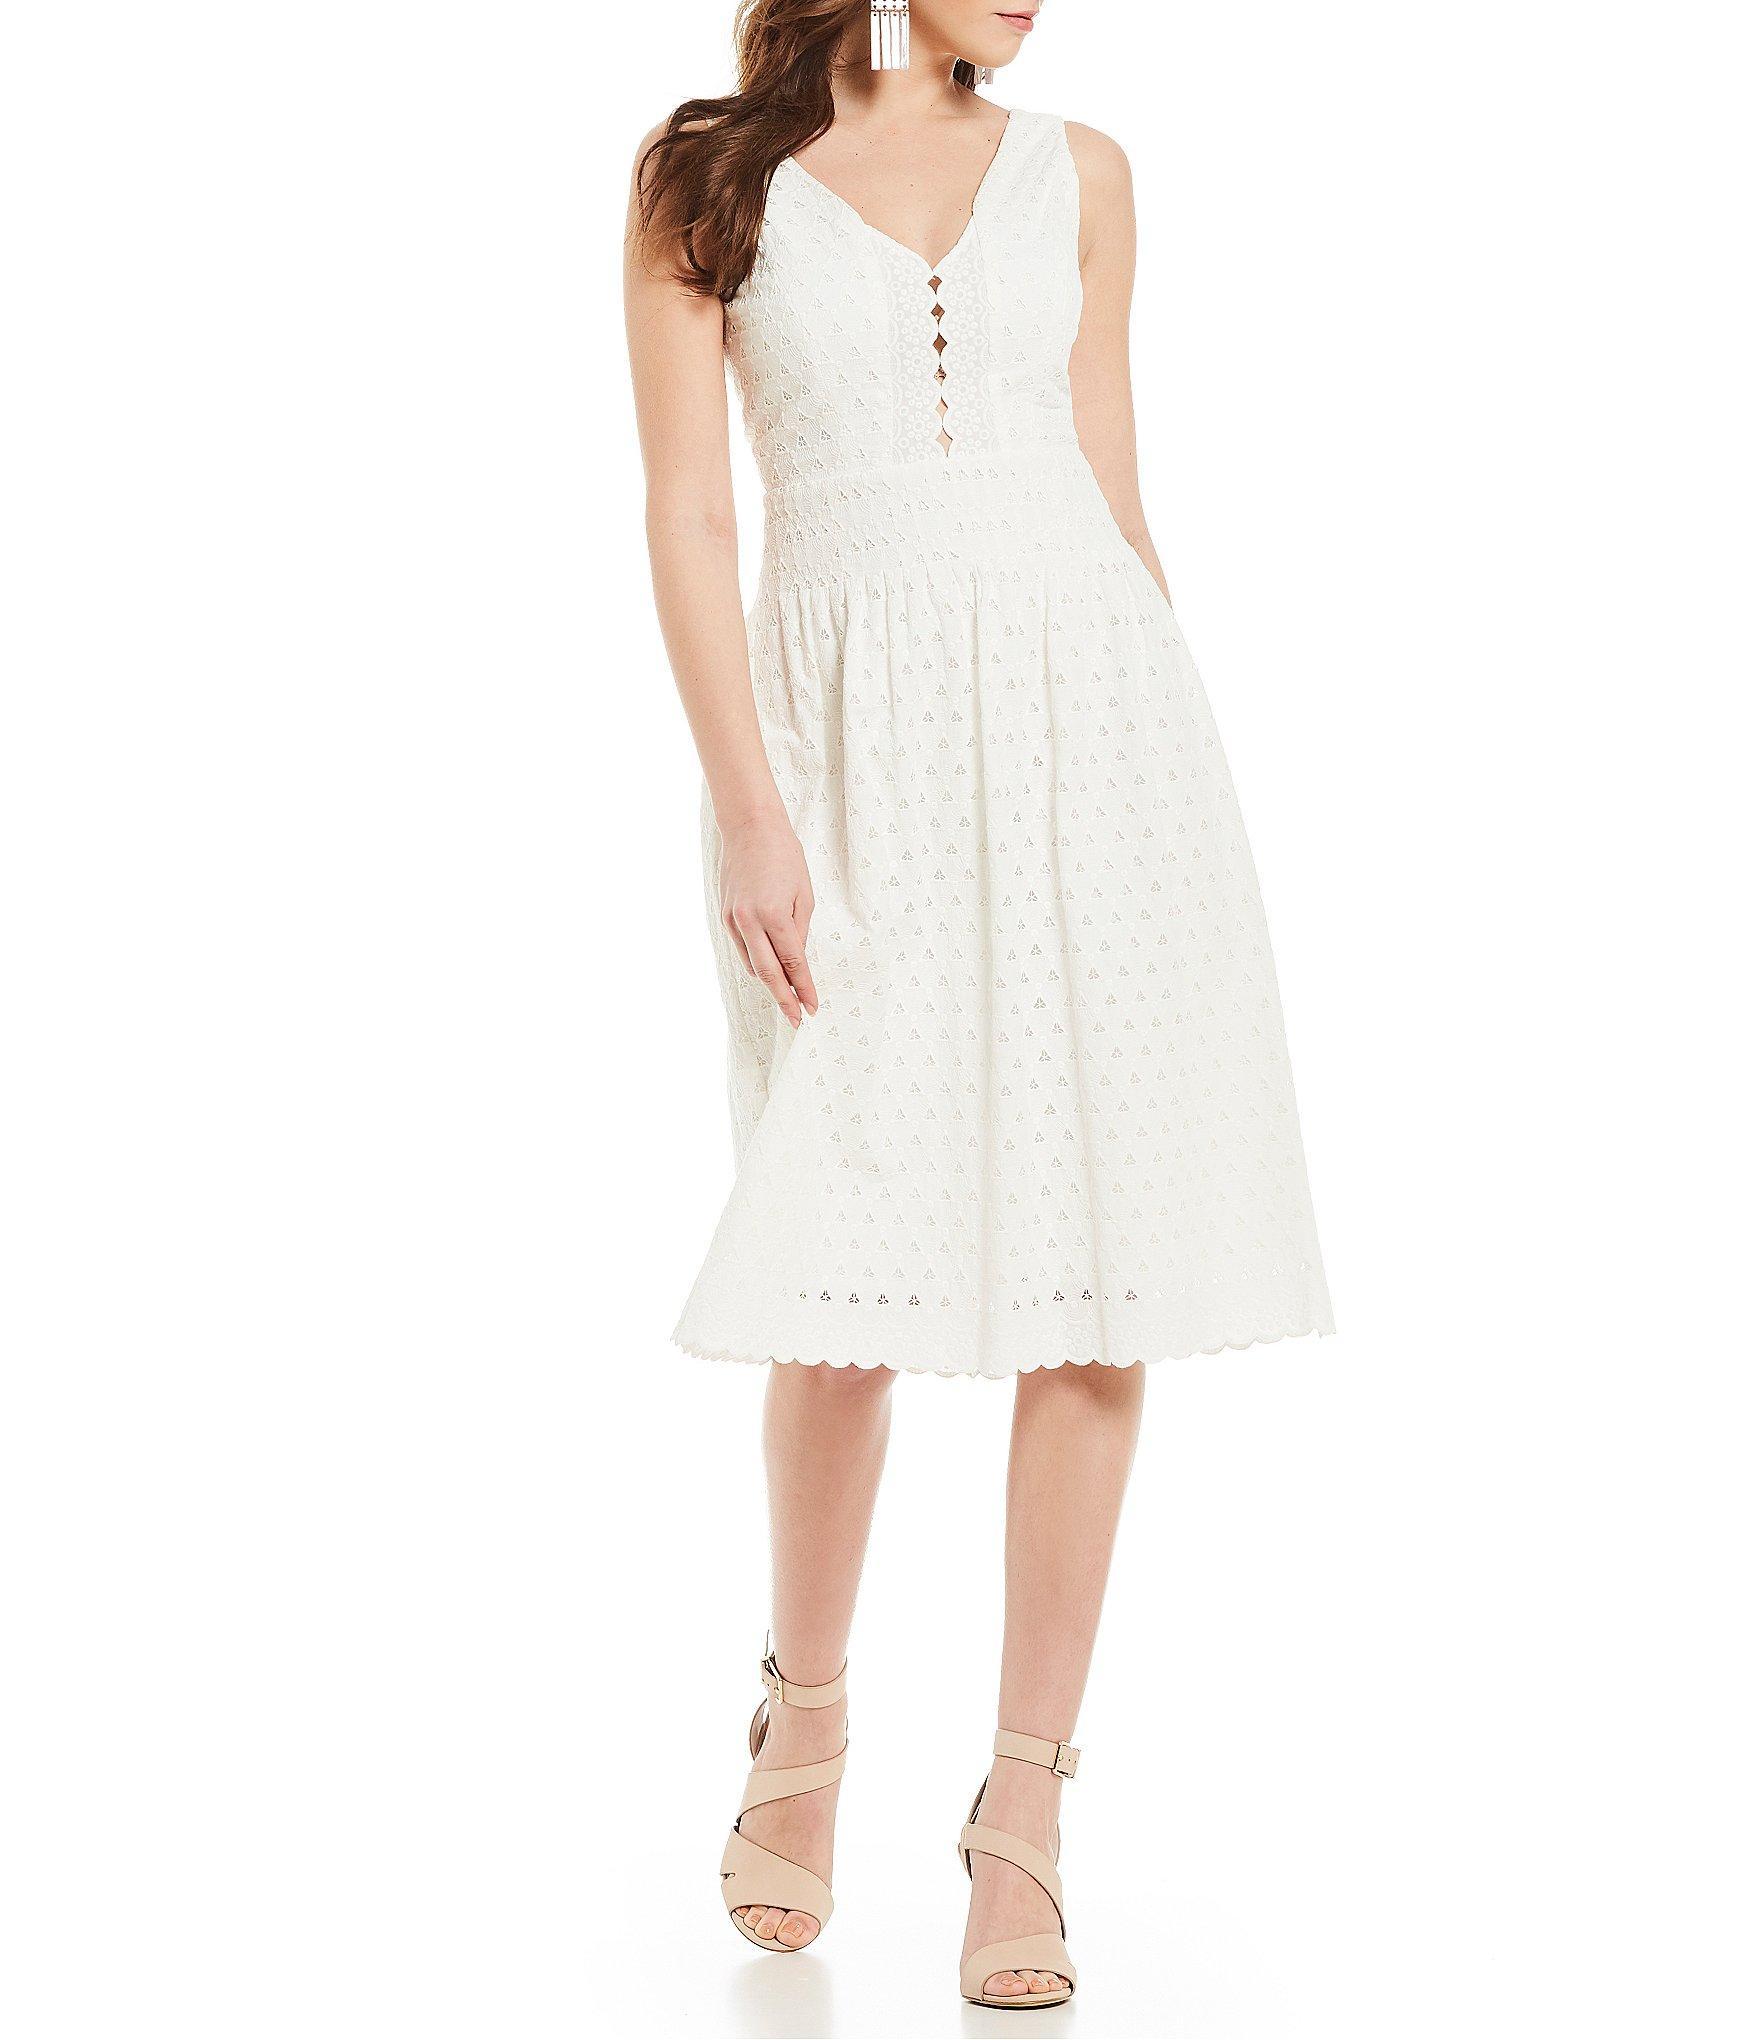 f7208d1269 Lyst - Gianni Bini Venda Eyelet Sleeveless V-neck Midi Dress in White